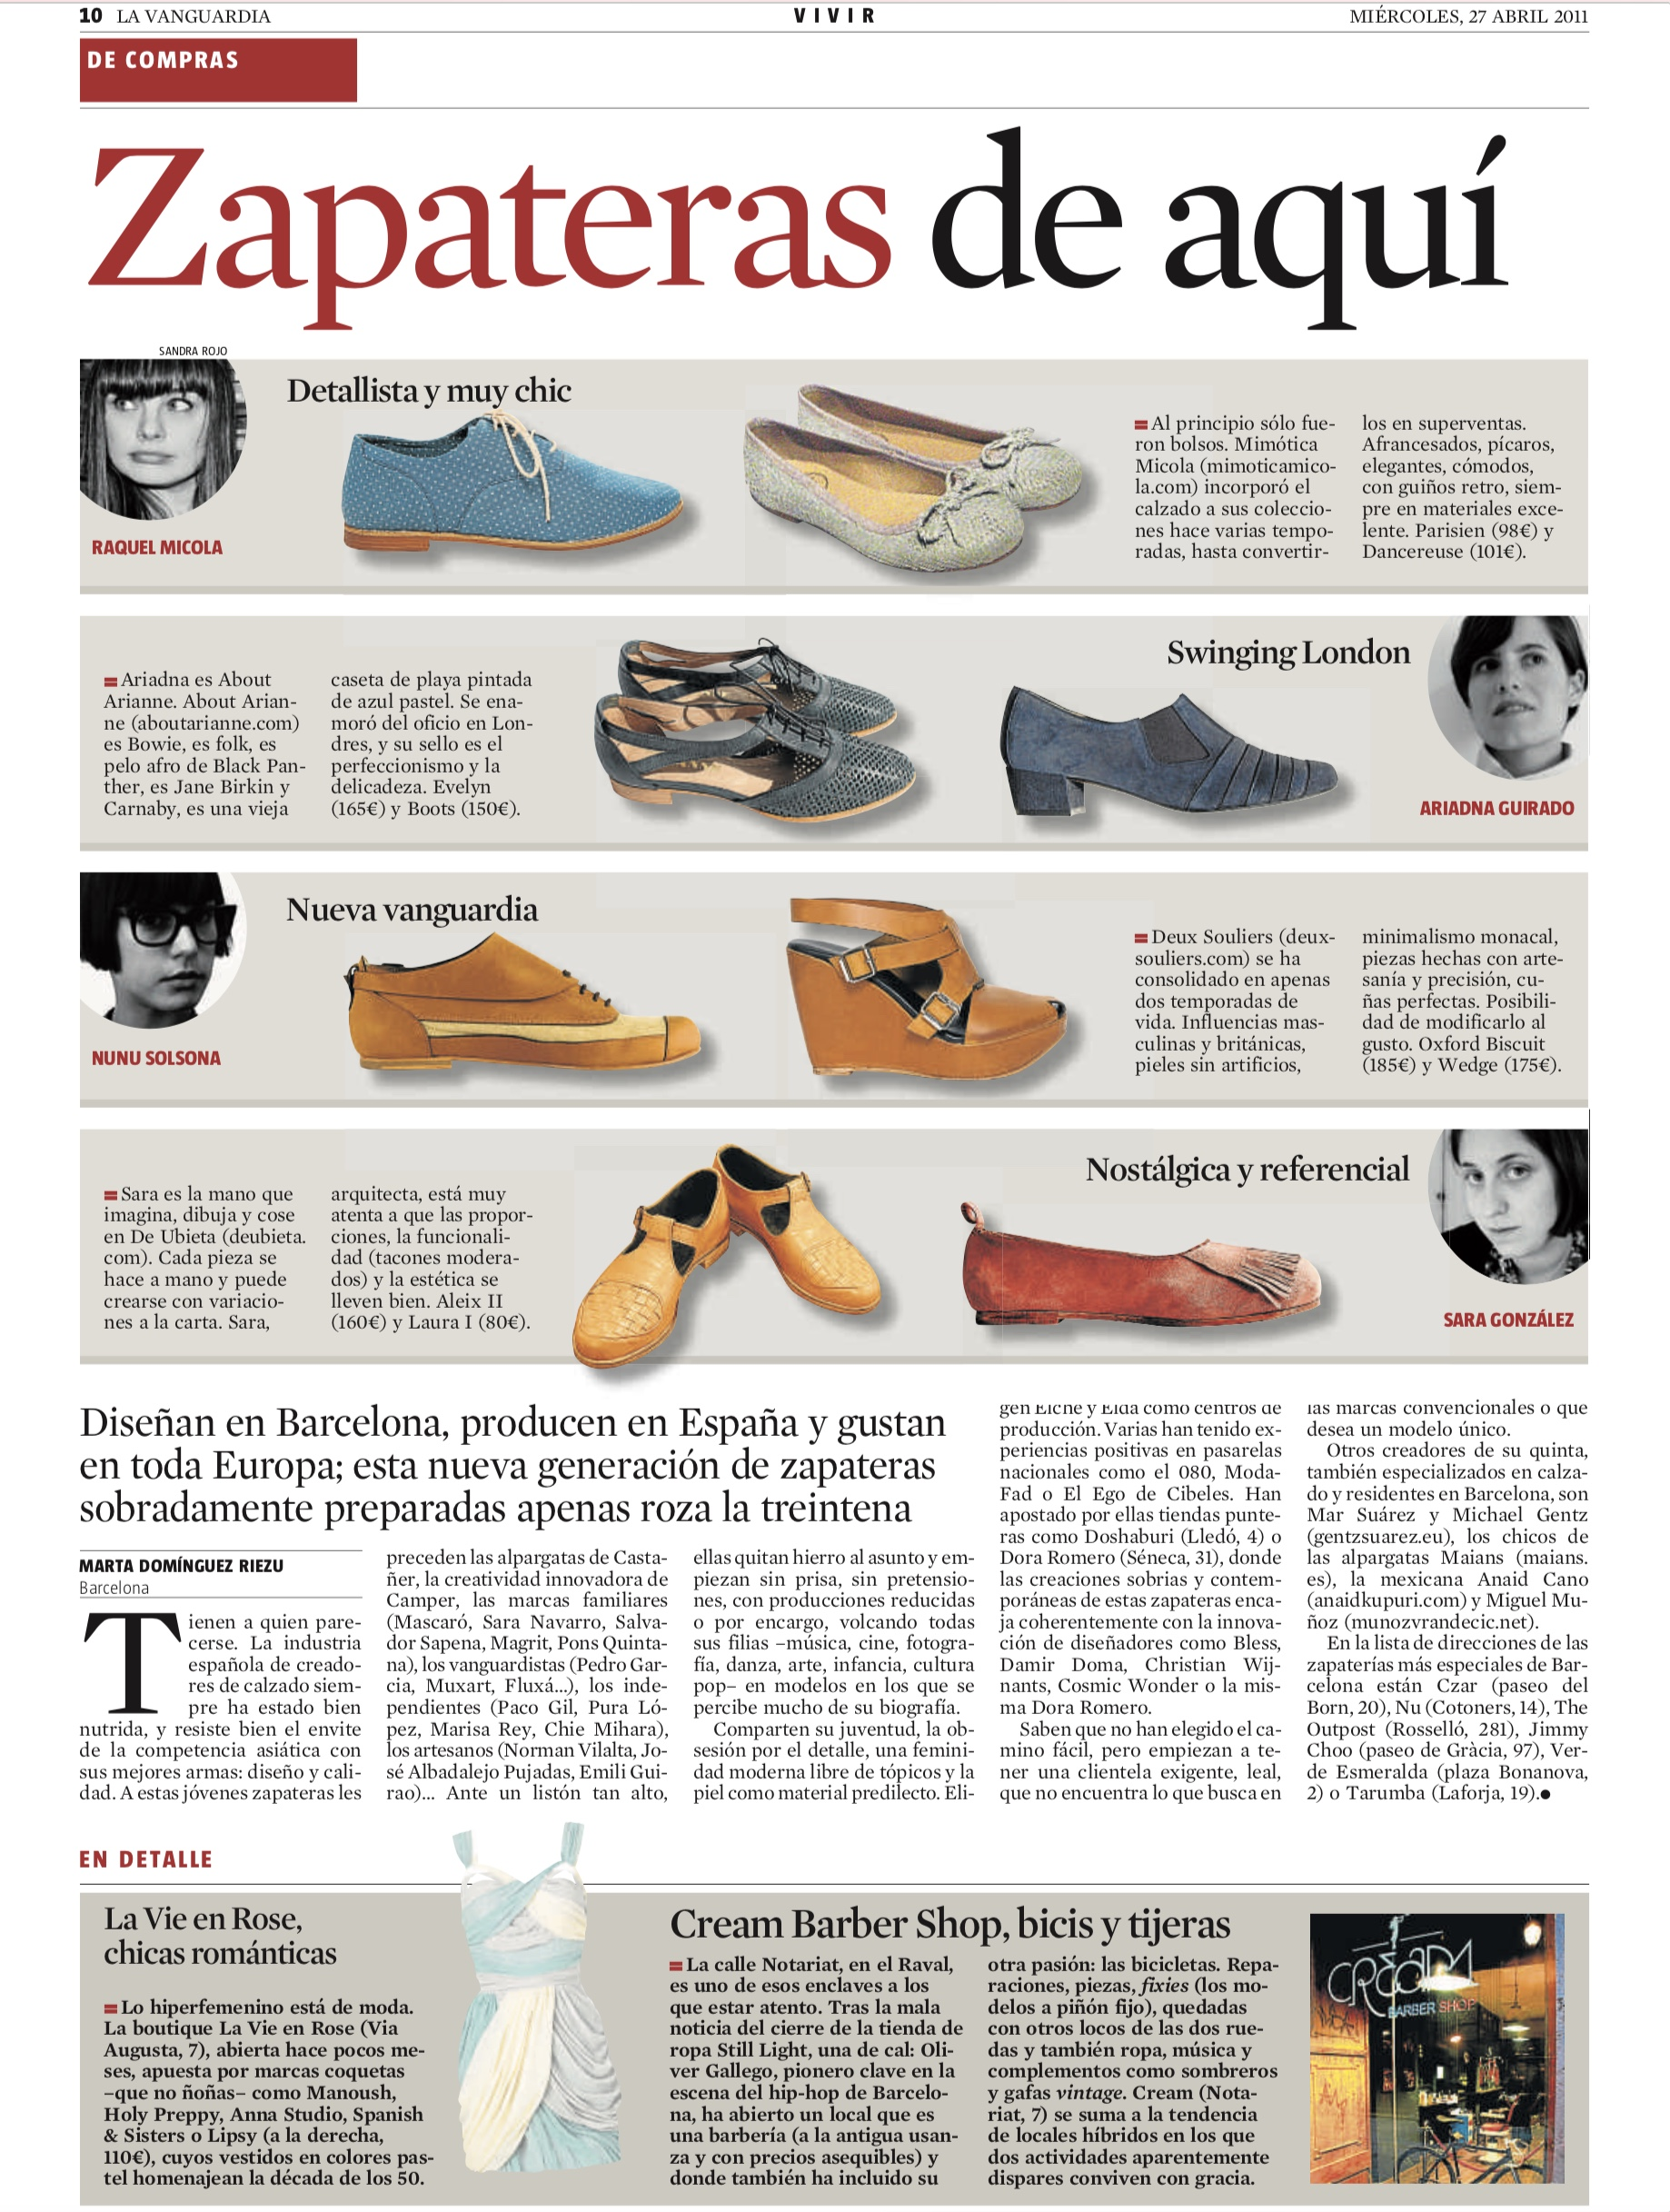 2011-04 La Vanguardia Mimotica.jpeg